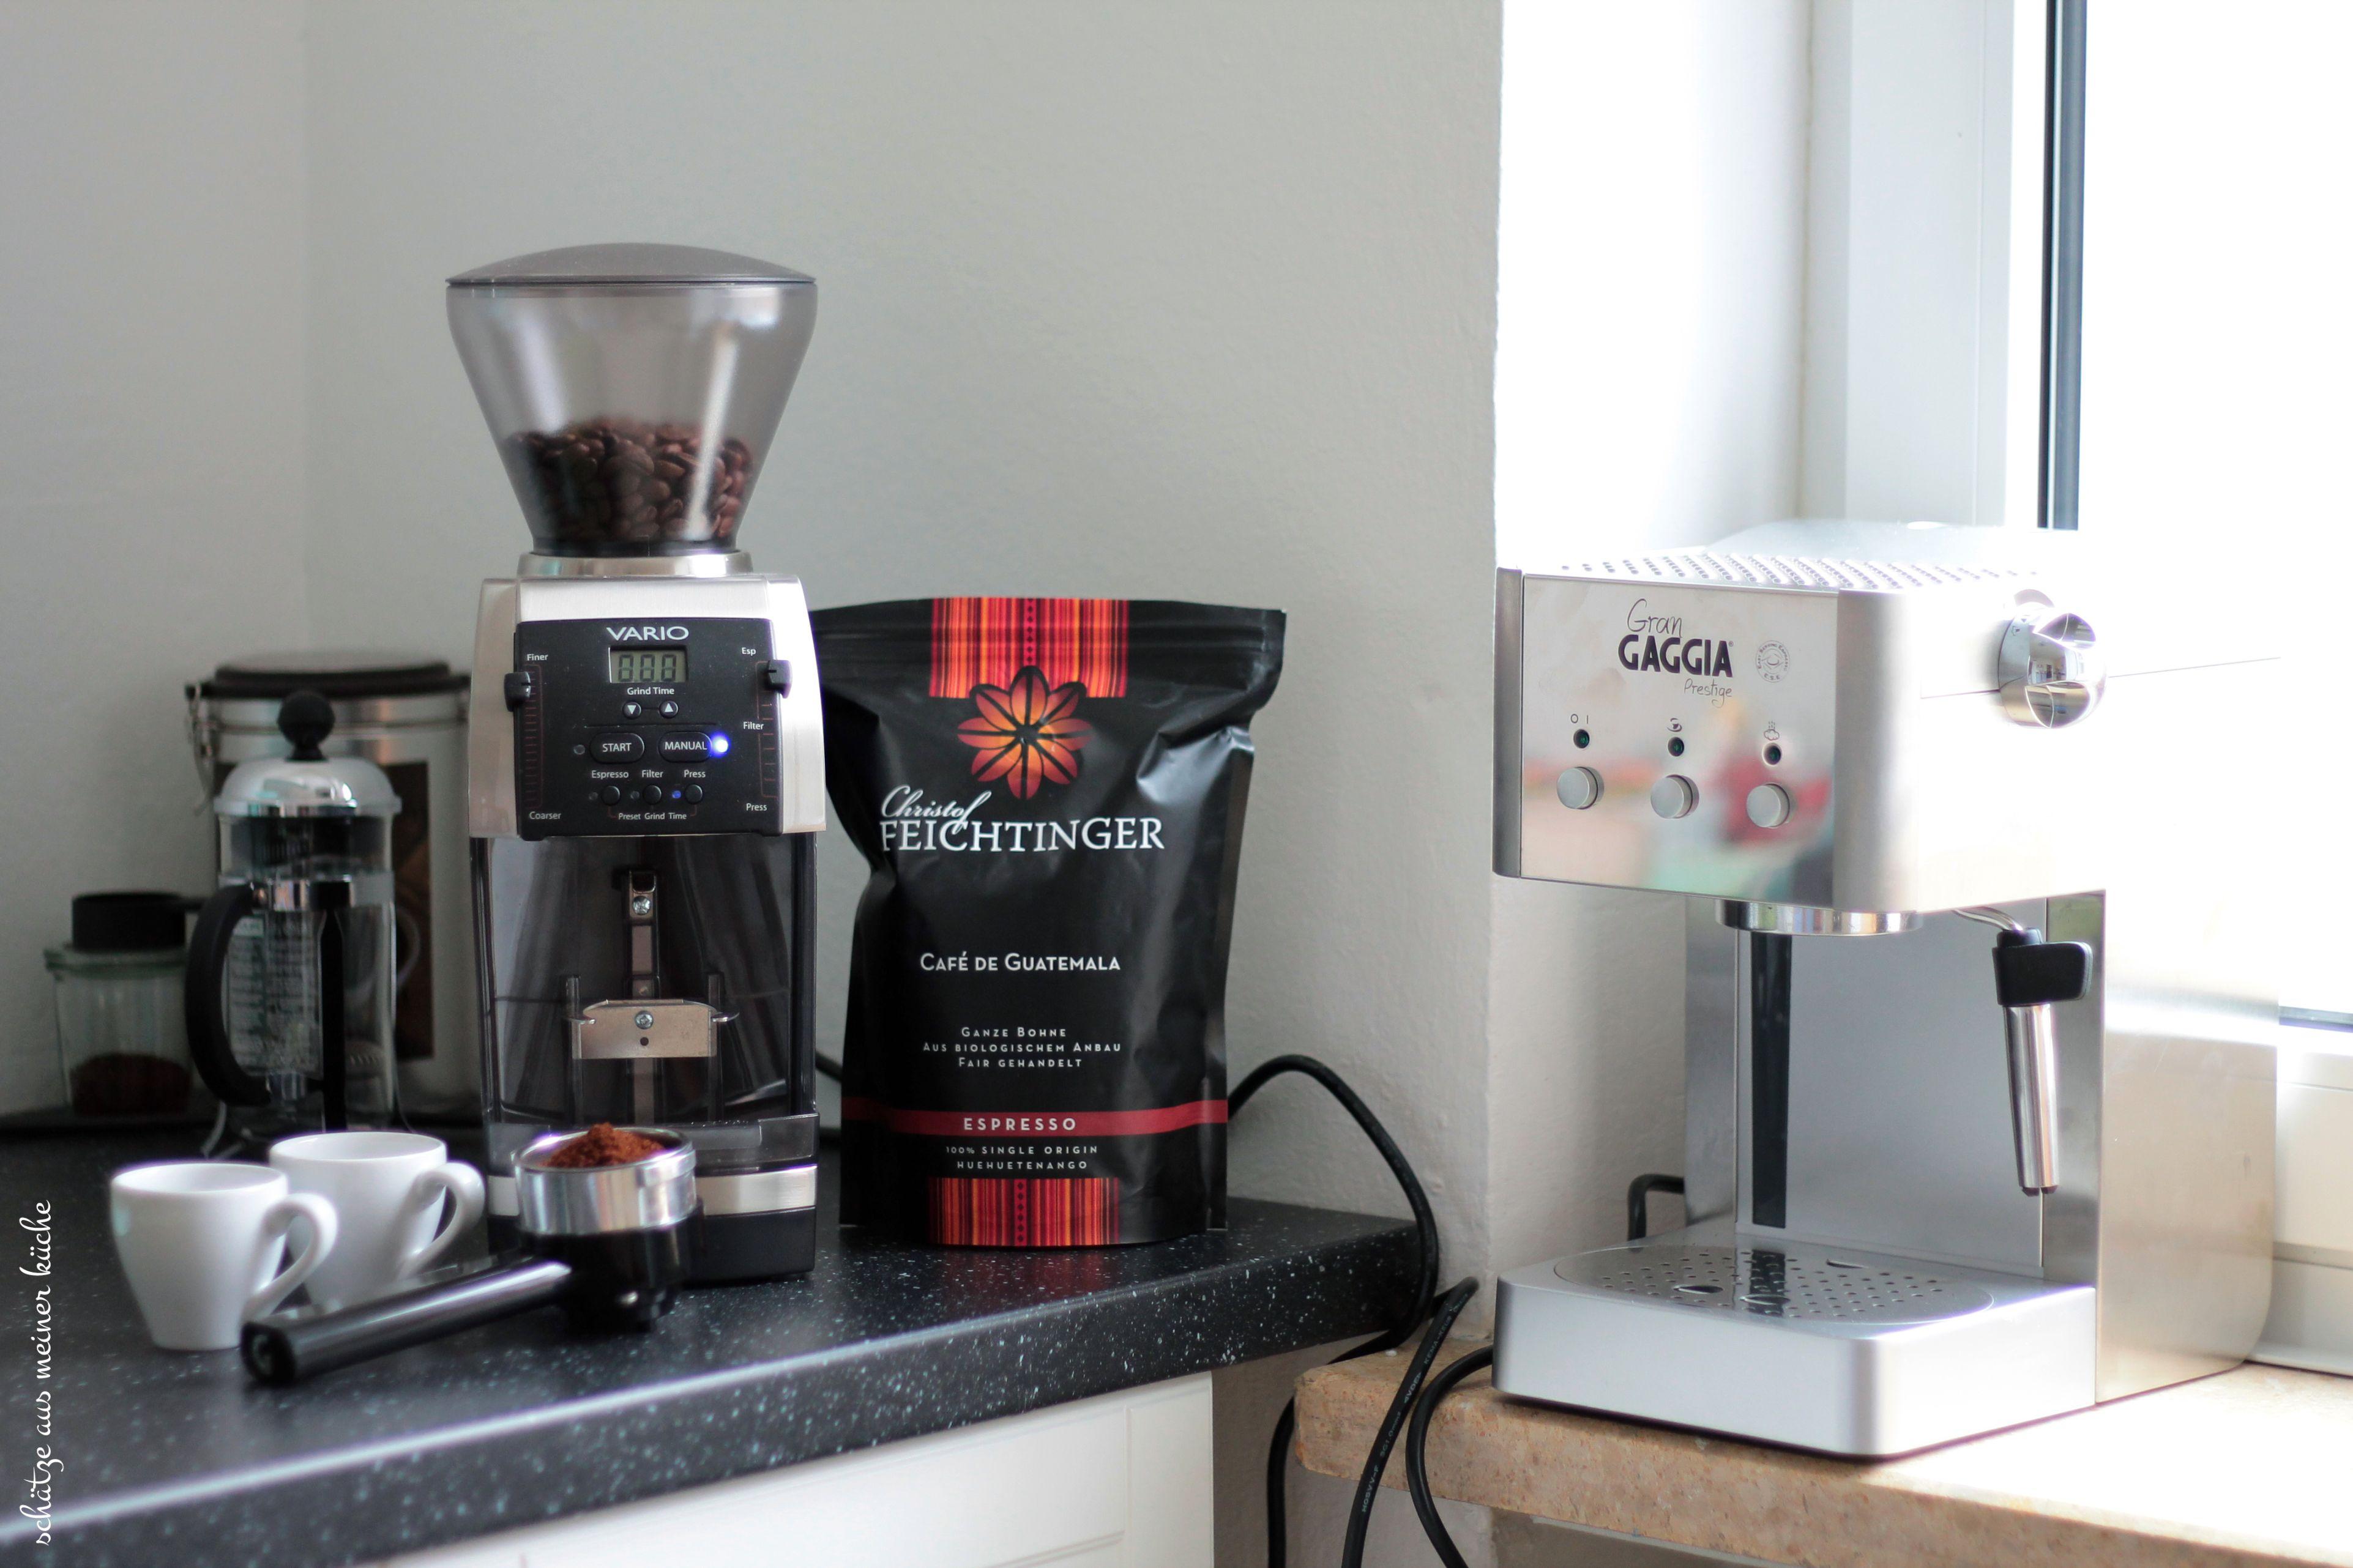 Espresso-Woche Gran Gaggia Prestige Mahlkönig Vario Home Christof Feichtinger Espresso Kaffee